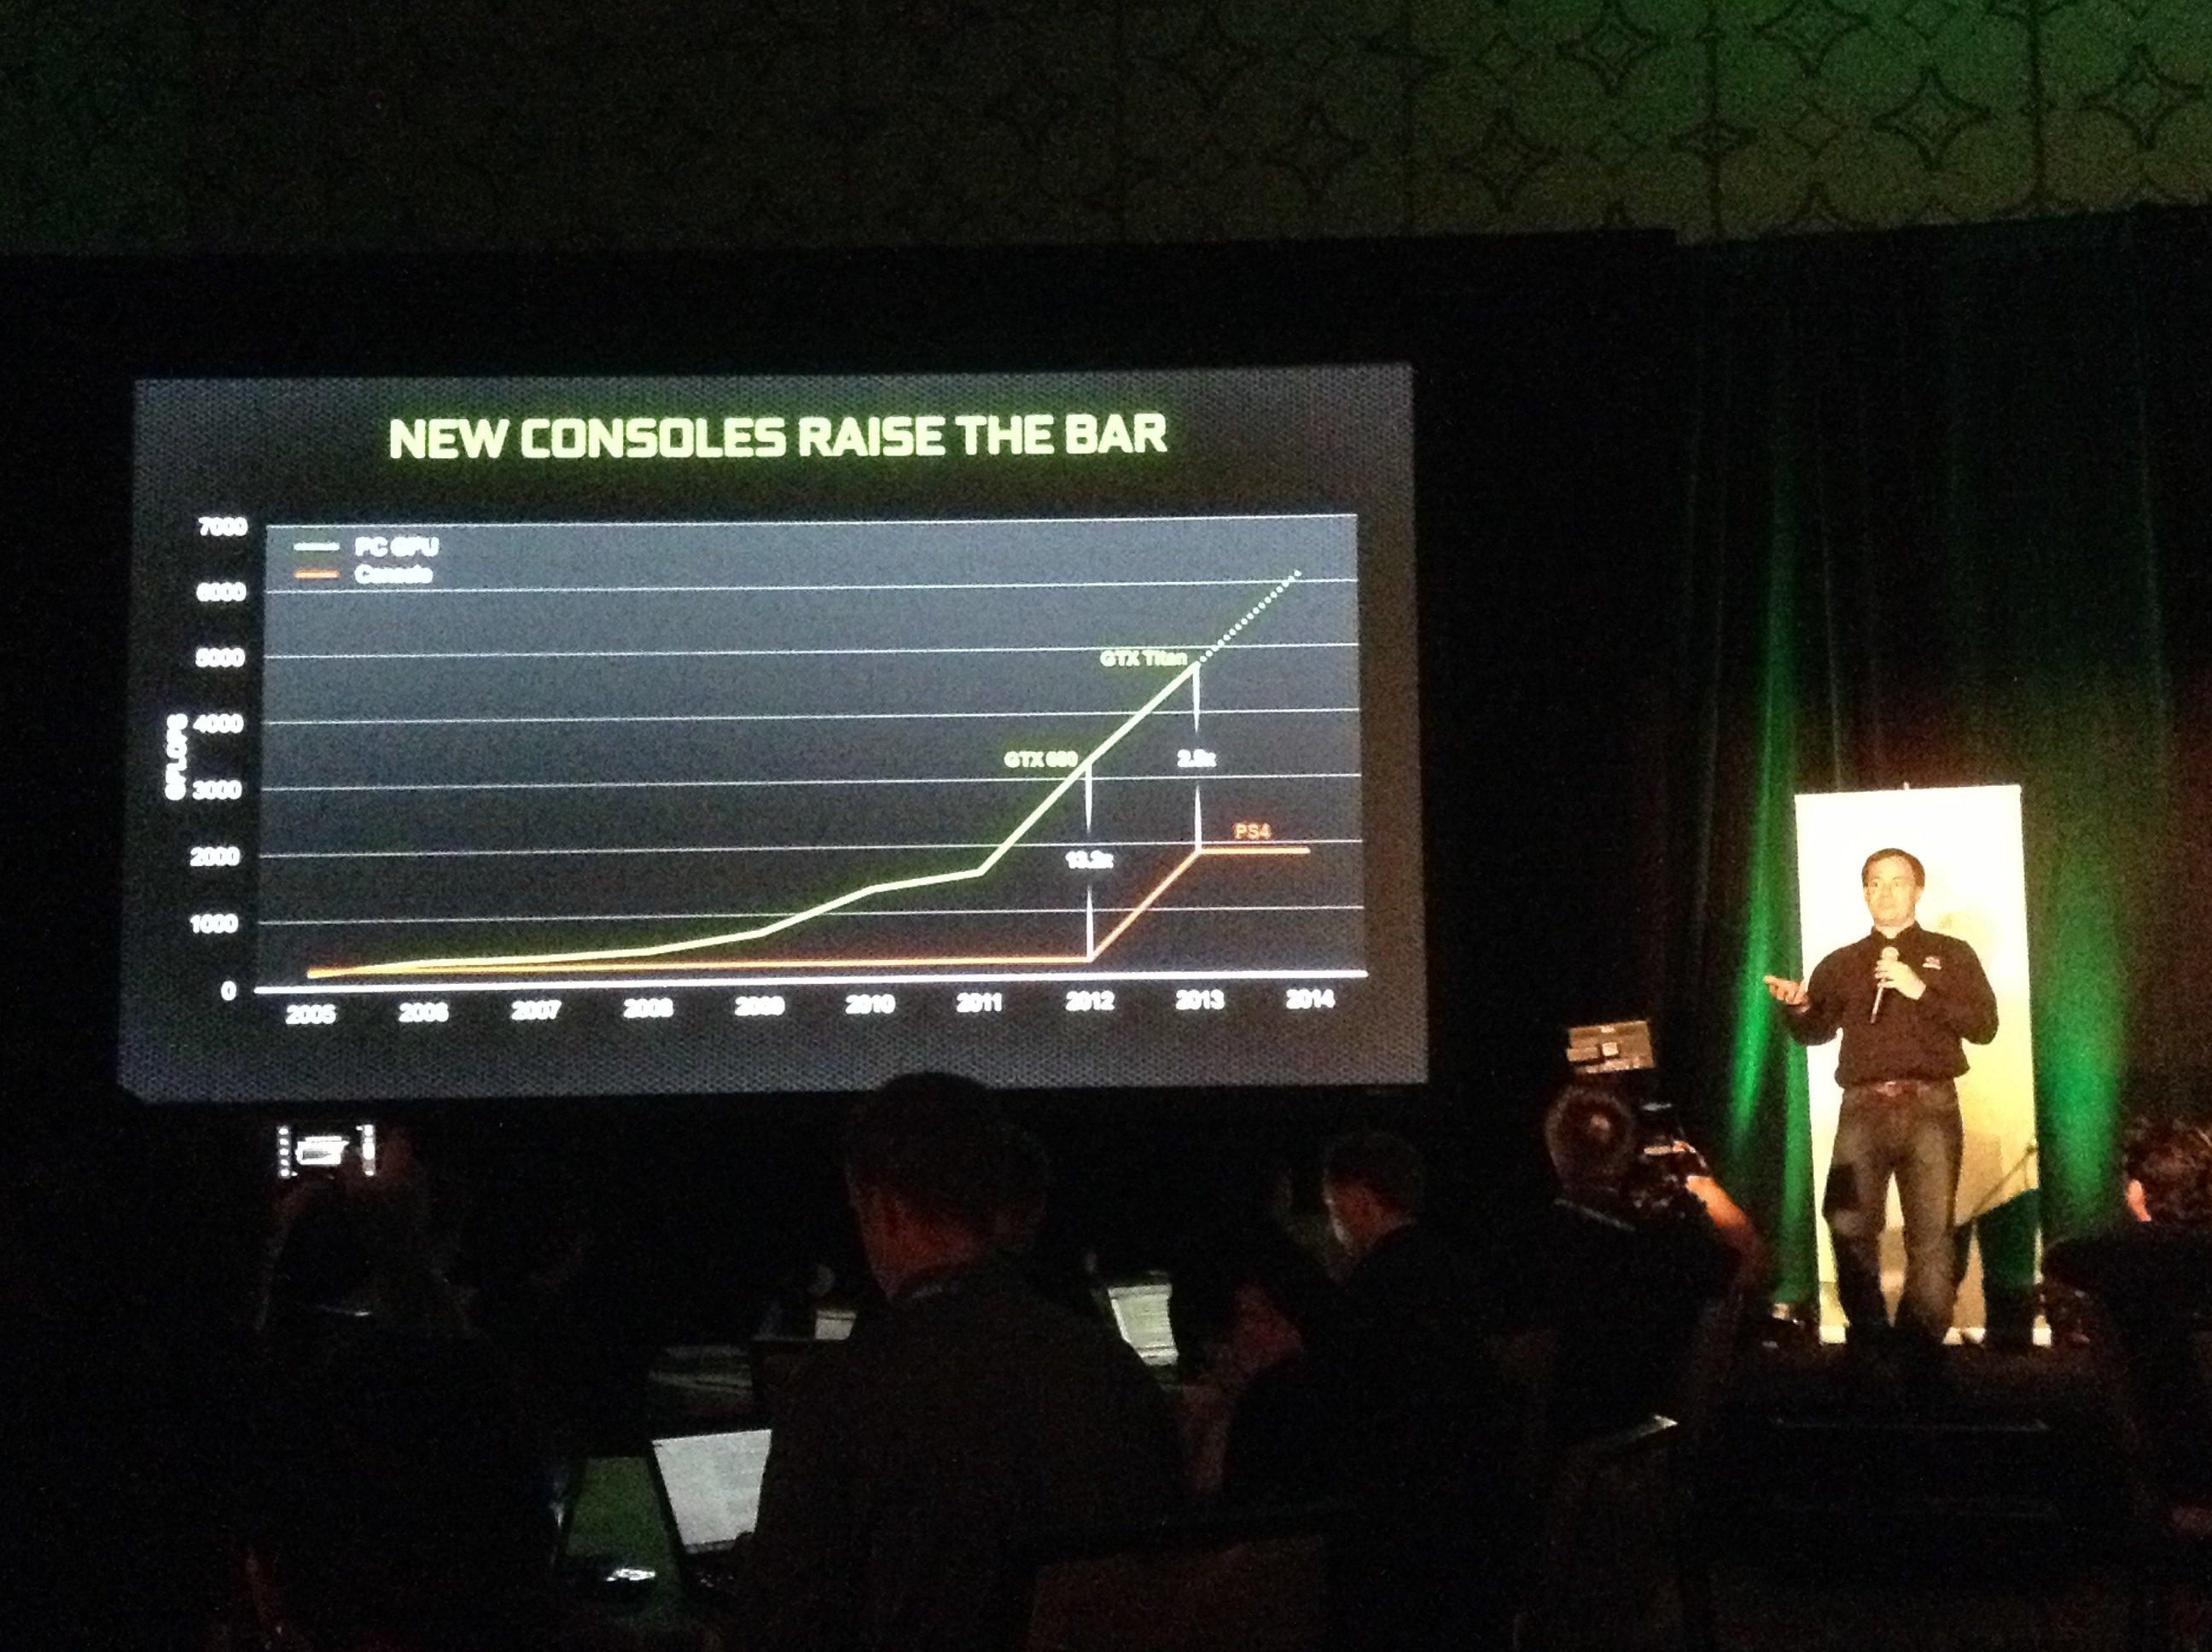 Nvidia показали крутое #e3 #nvidia - Изображение 1